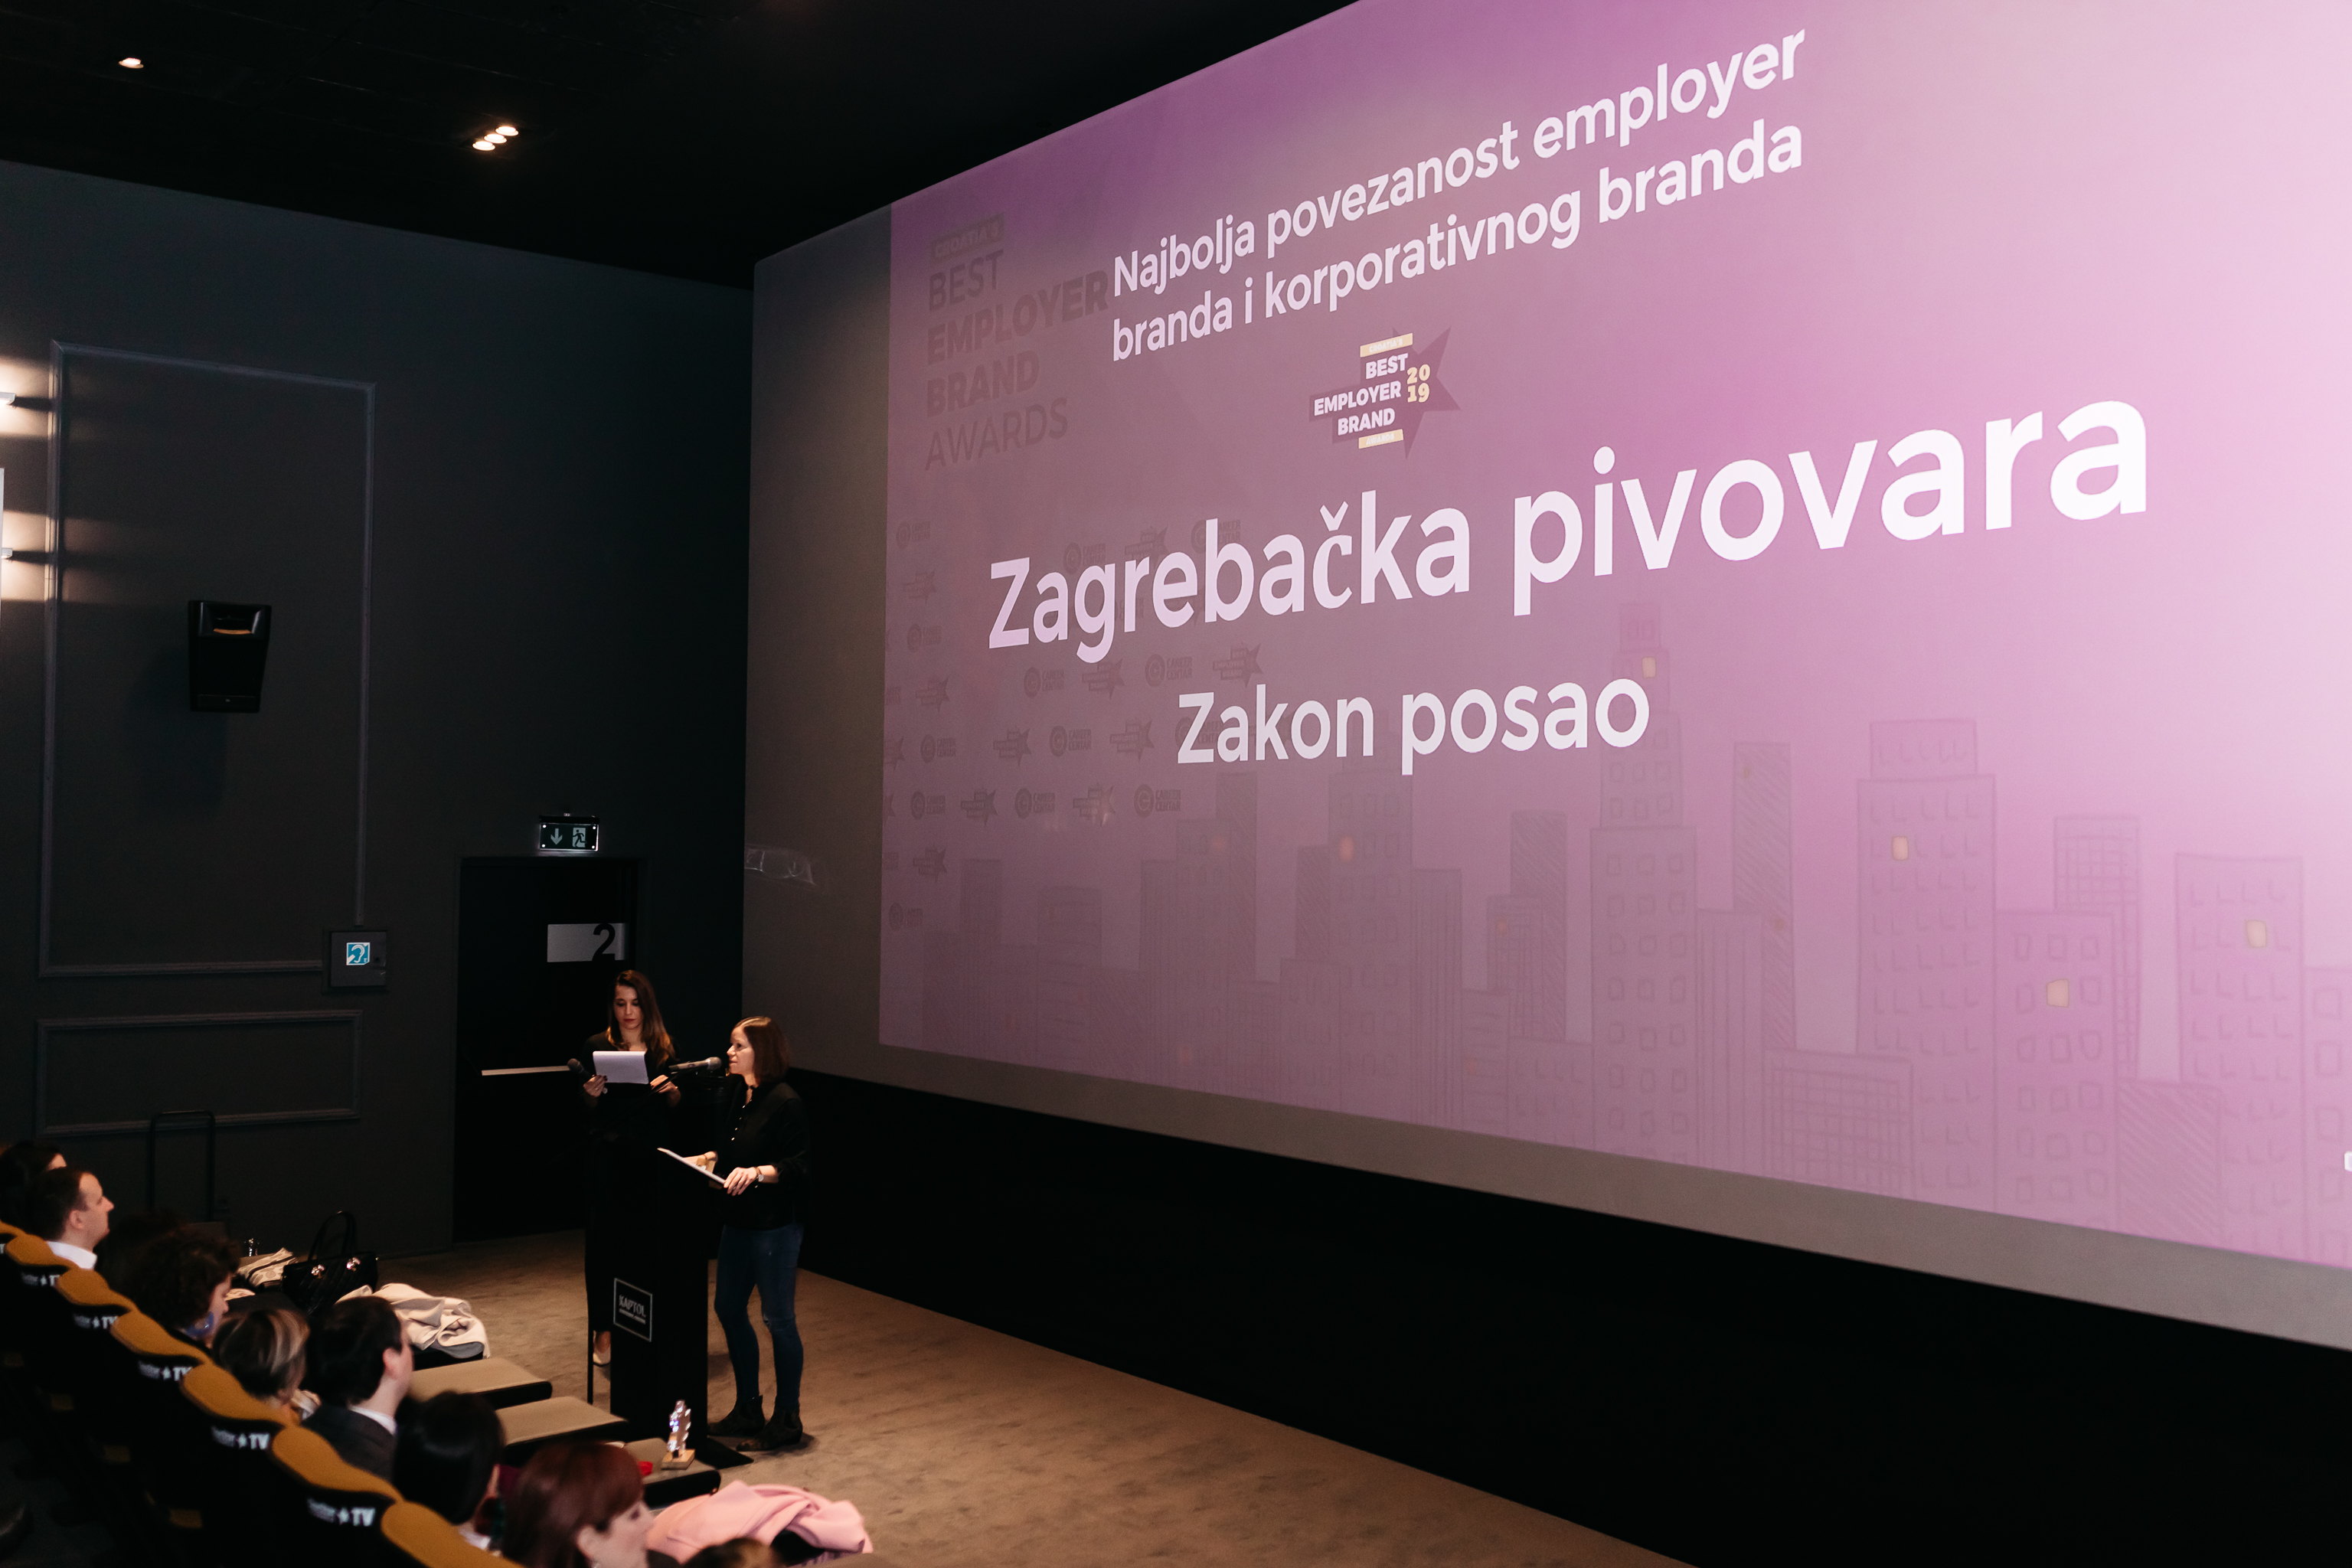 Zagrebačka pivovara - Zakon posao